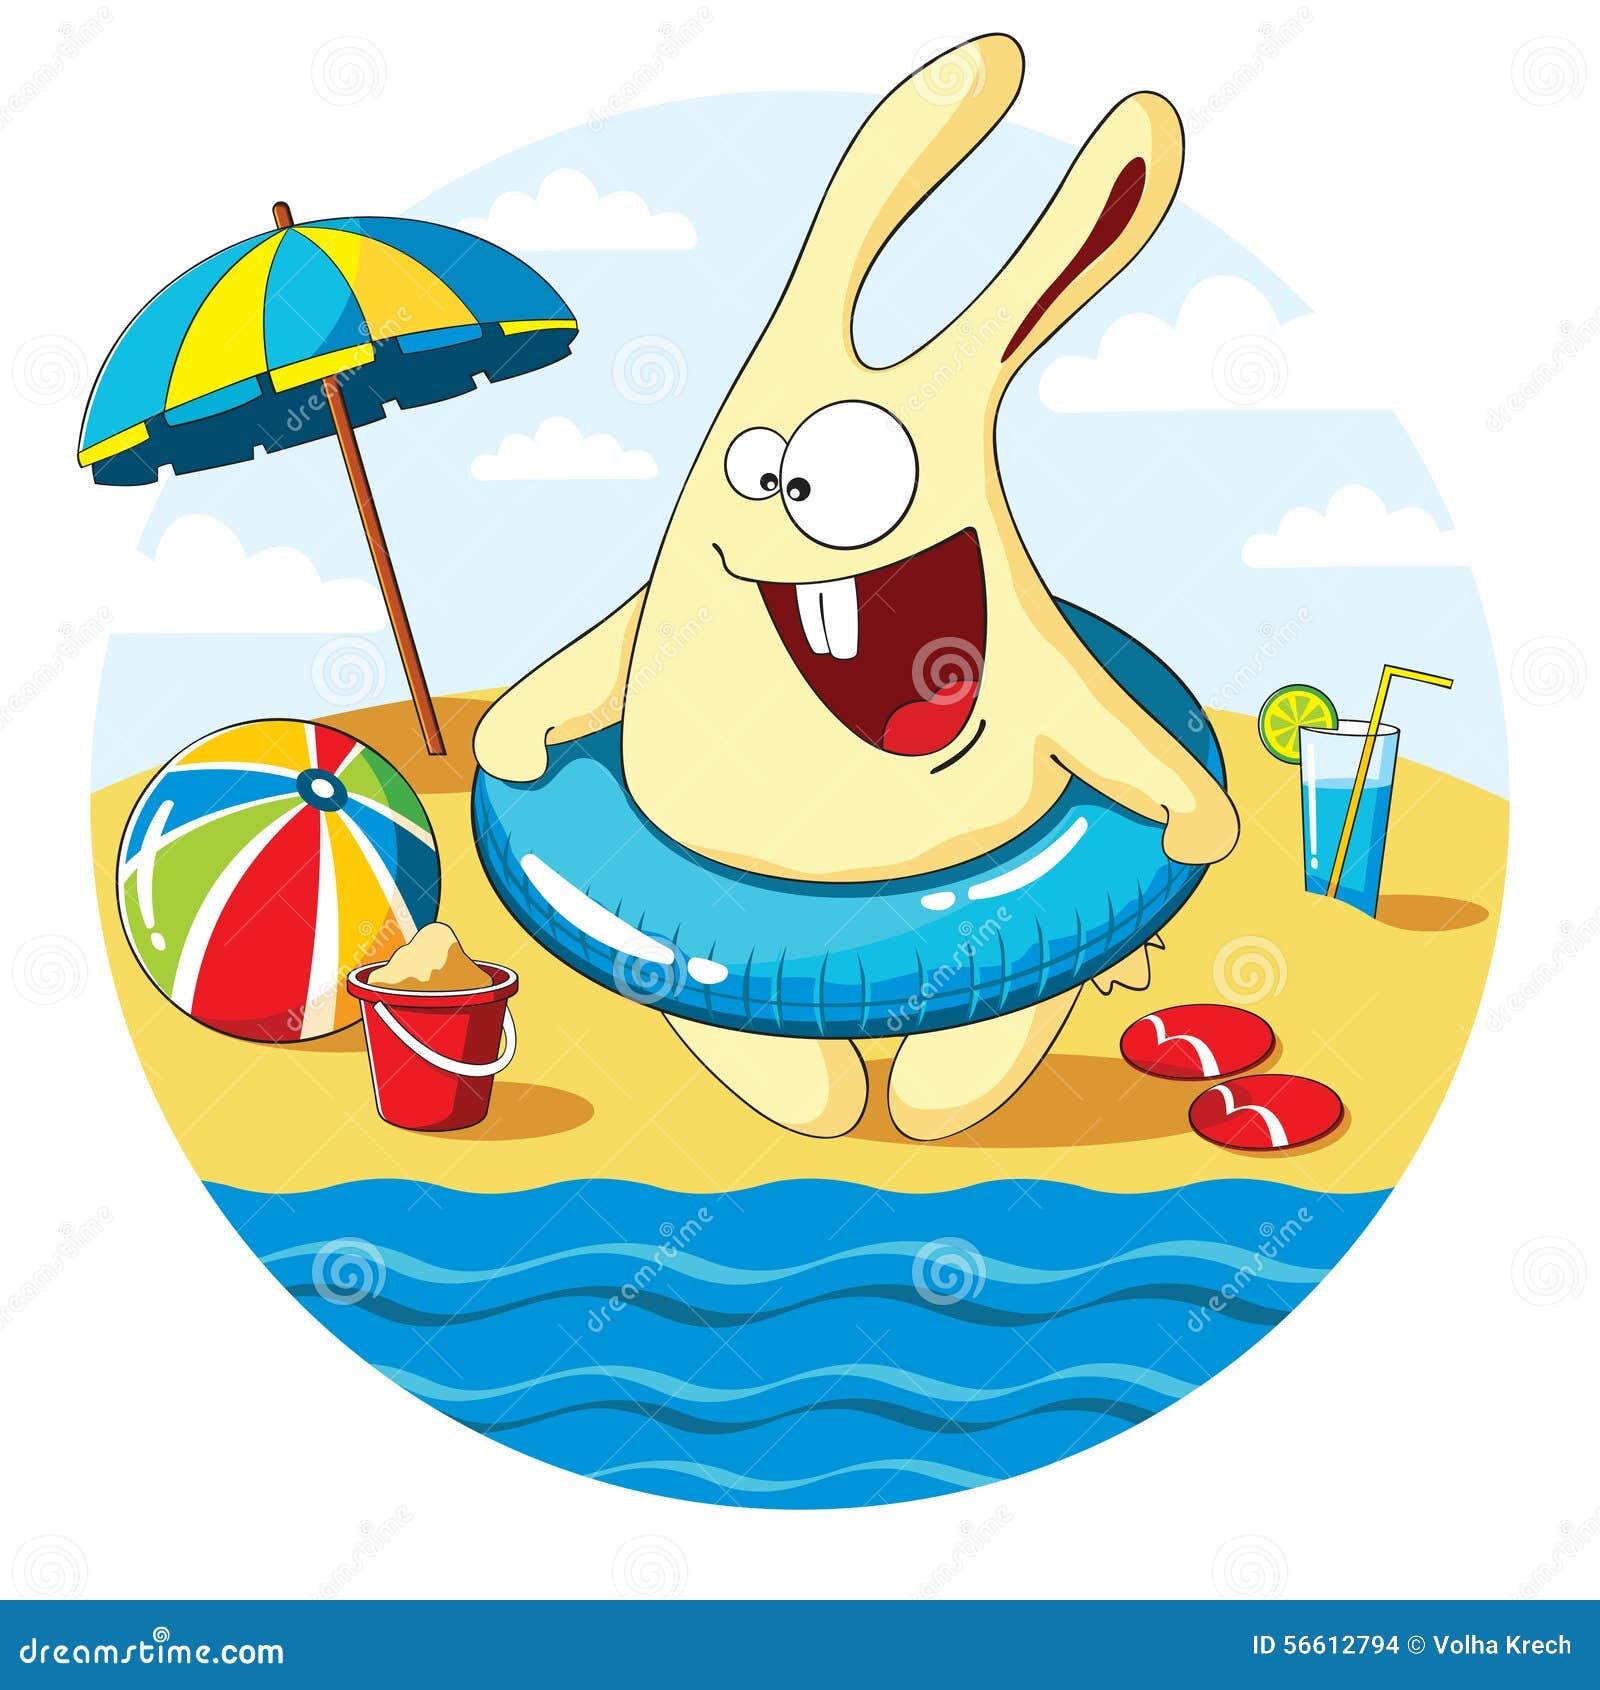 summer holiday cartoon - Holiday Cartoon Images